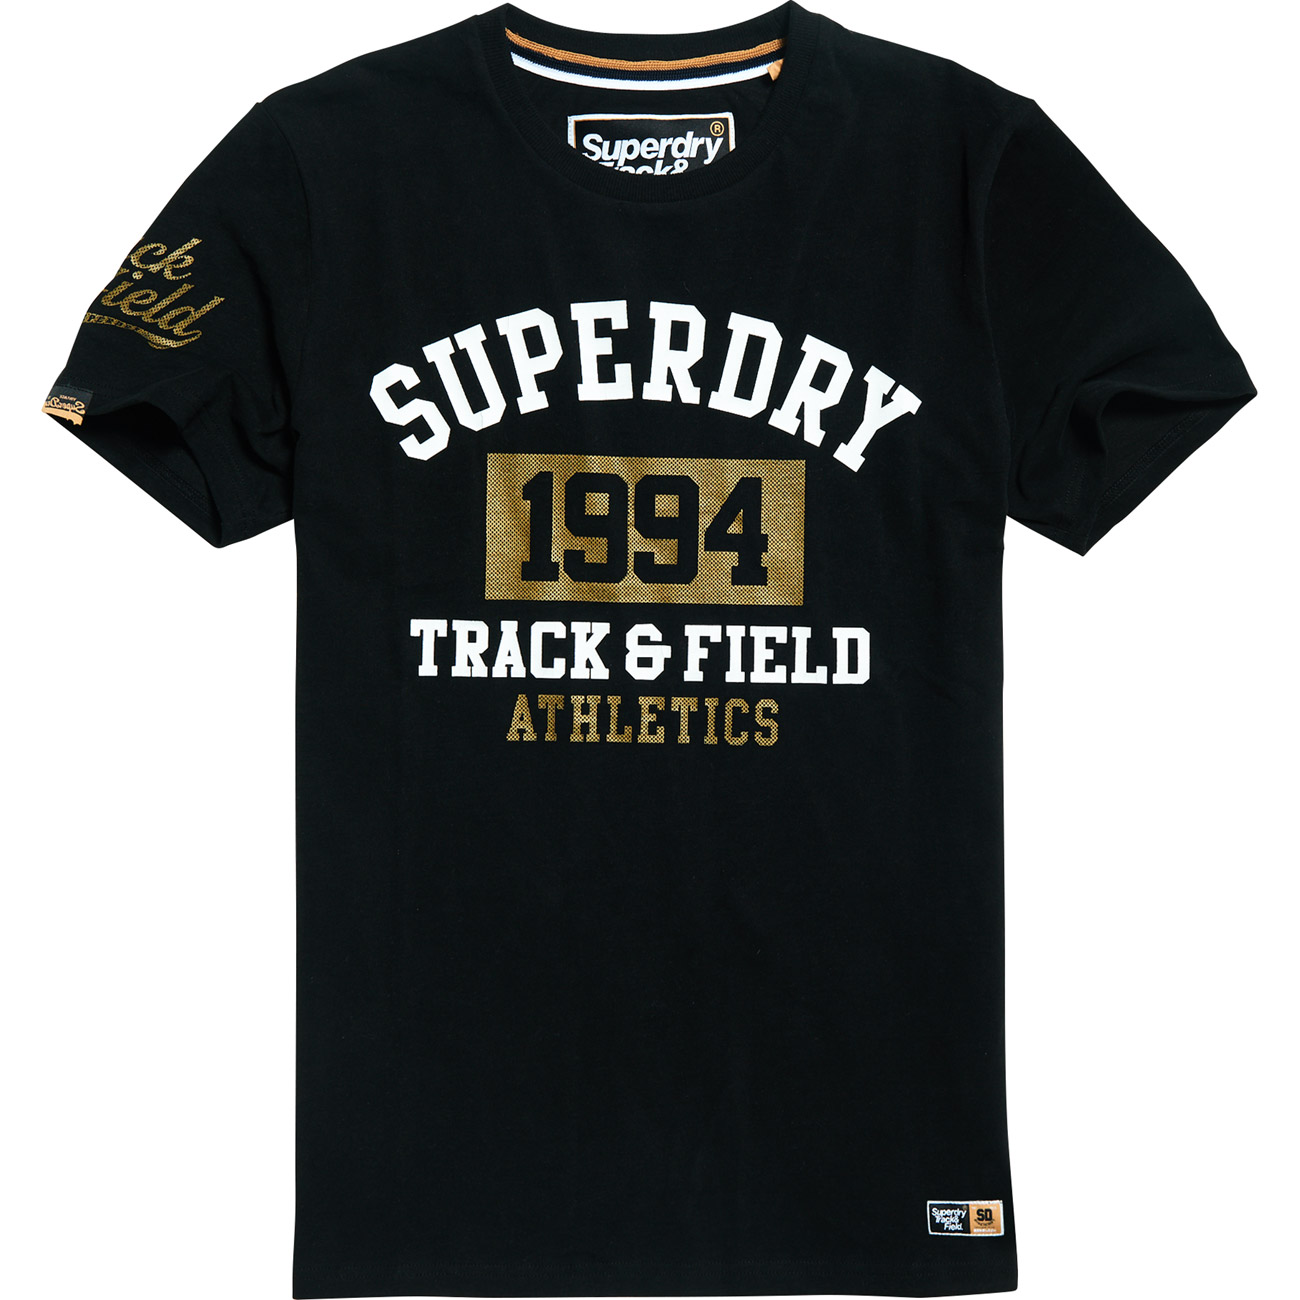 Superdry Herren Kastenförmiges 1994 Metallic T-Shirt